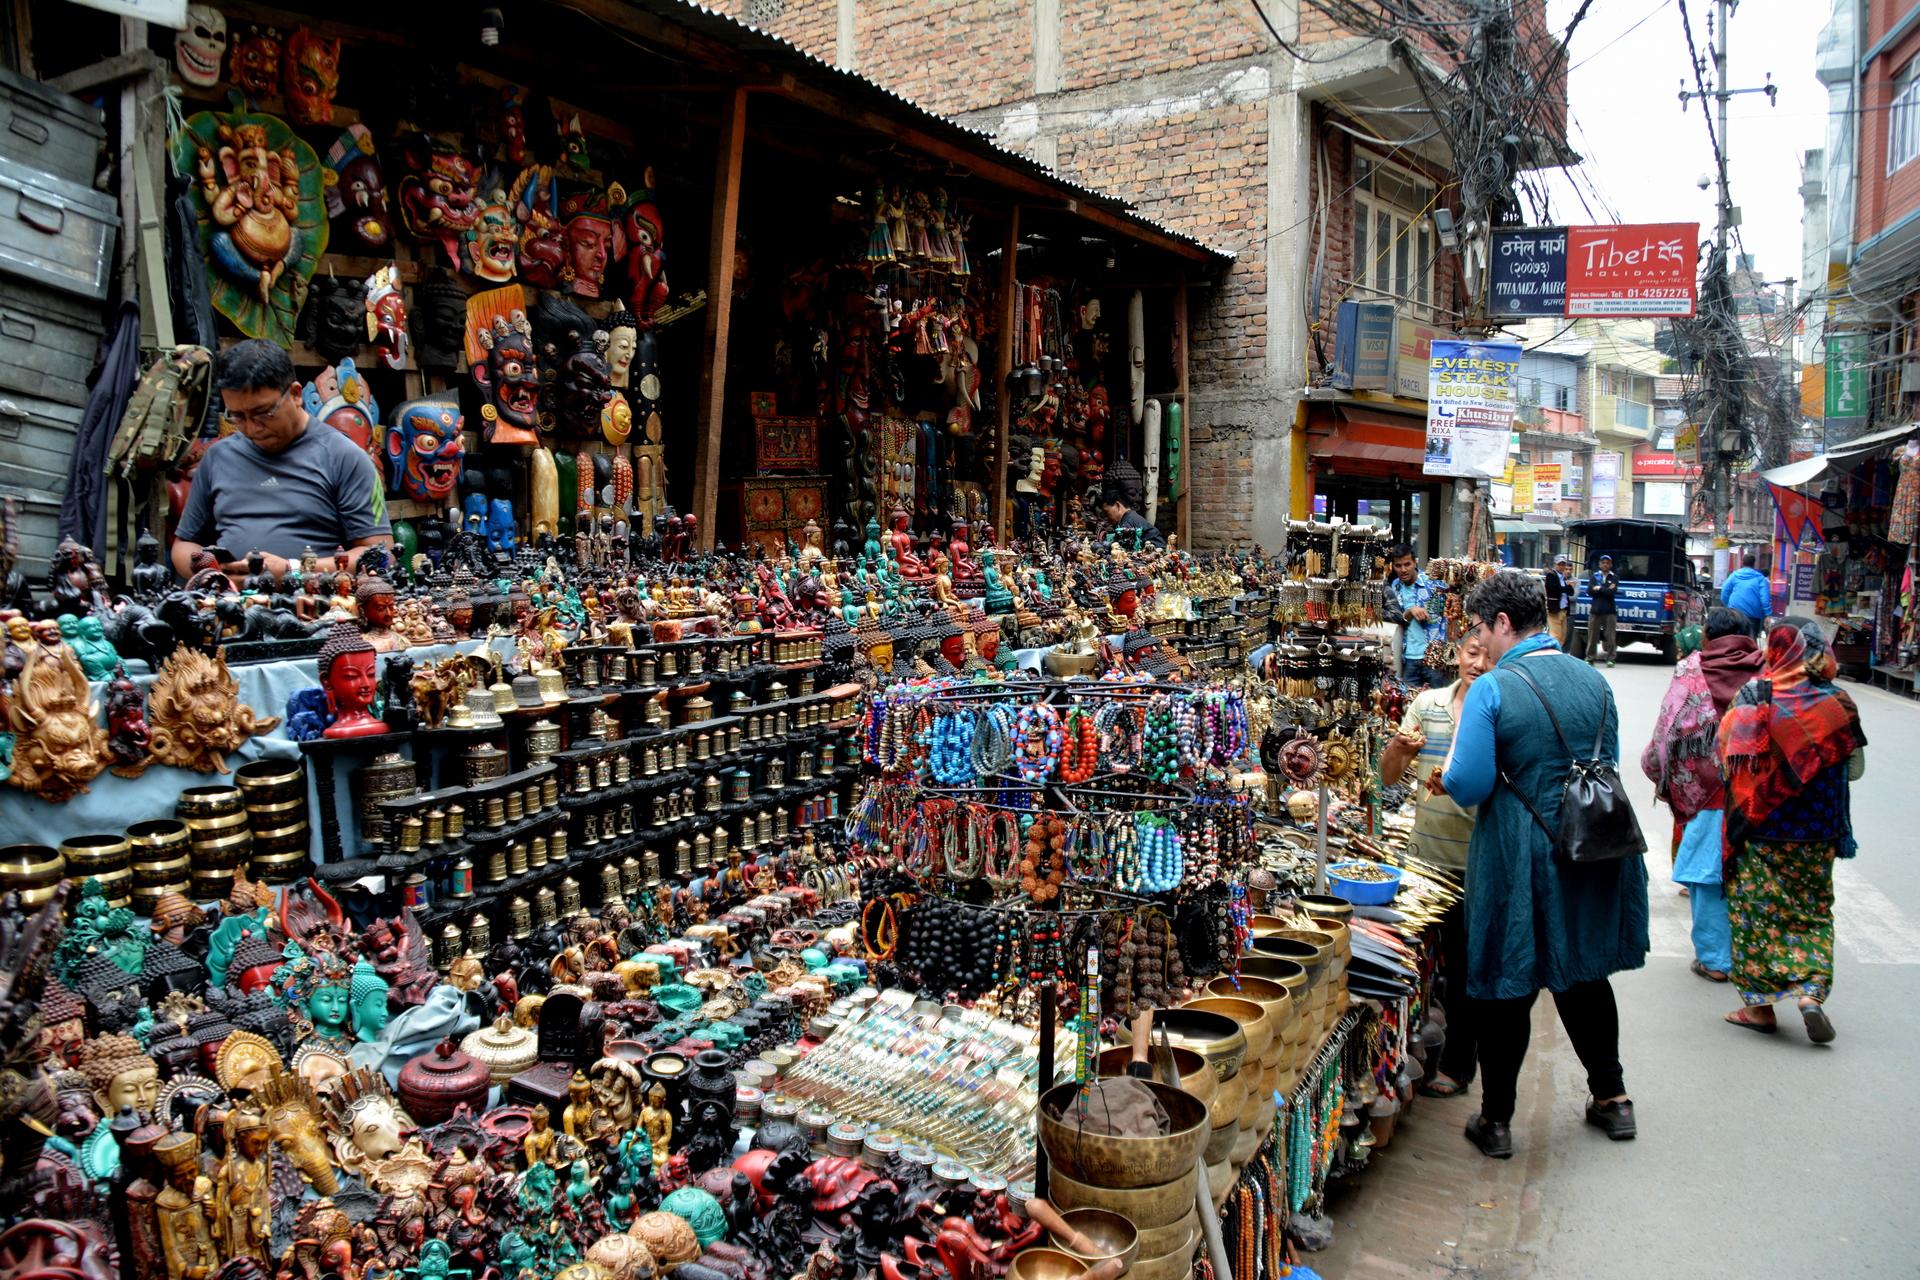 Compras_-_loja_de_souvenir_em_Kathmandu